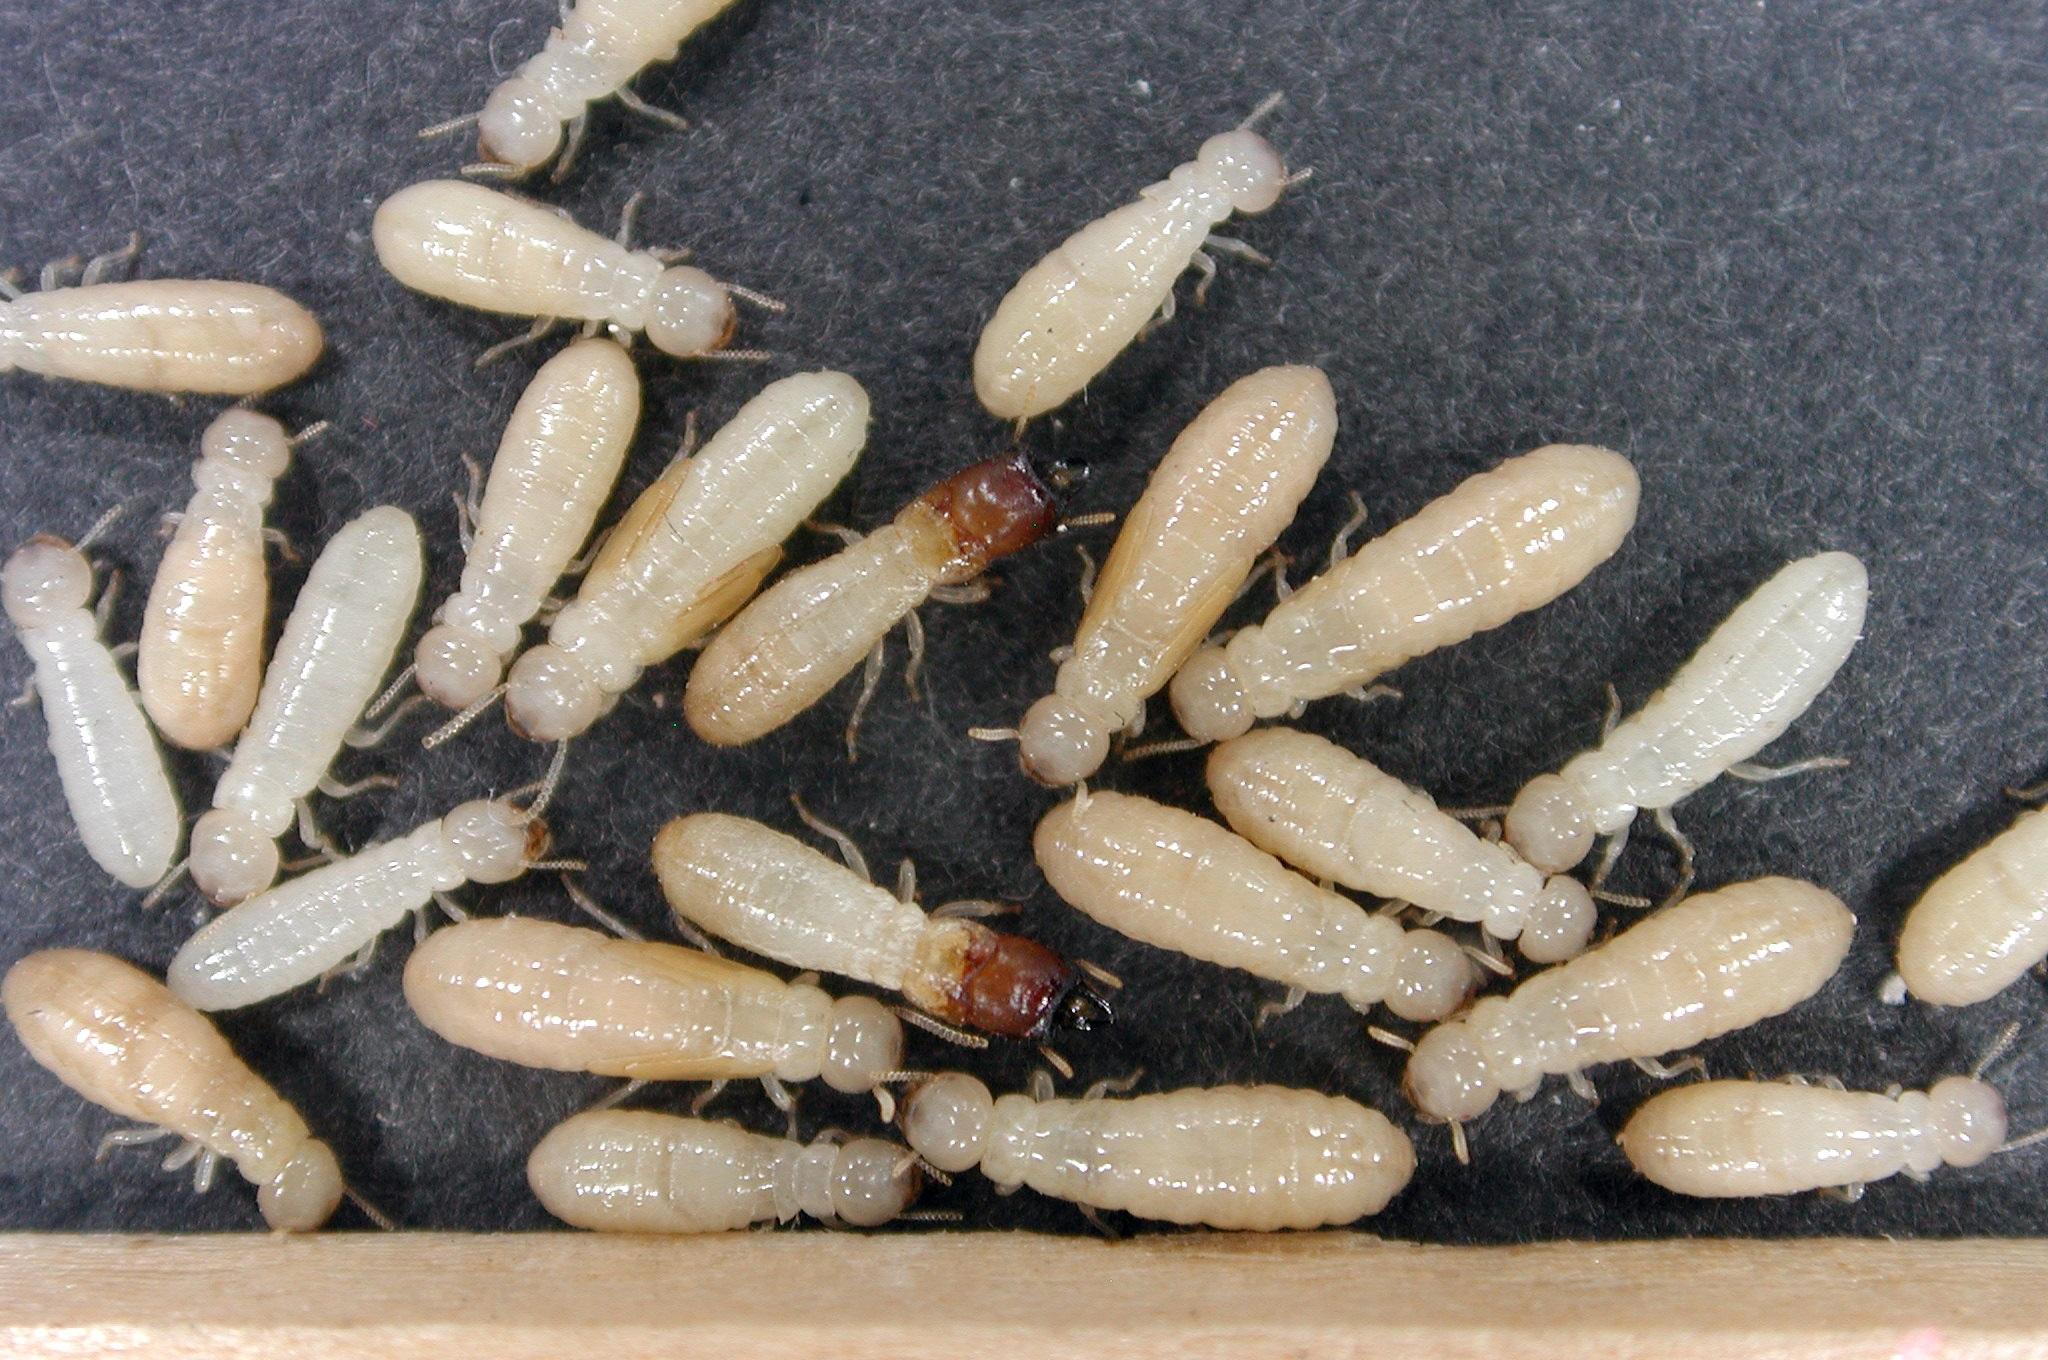 Pest Control Services in Atlantic County NJ